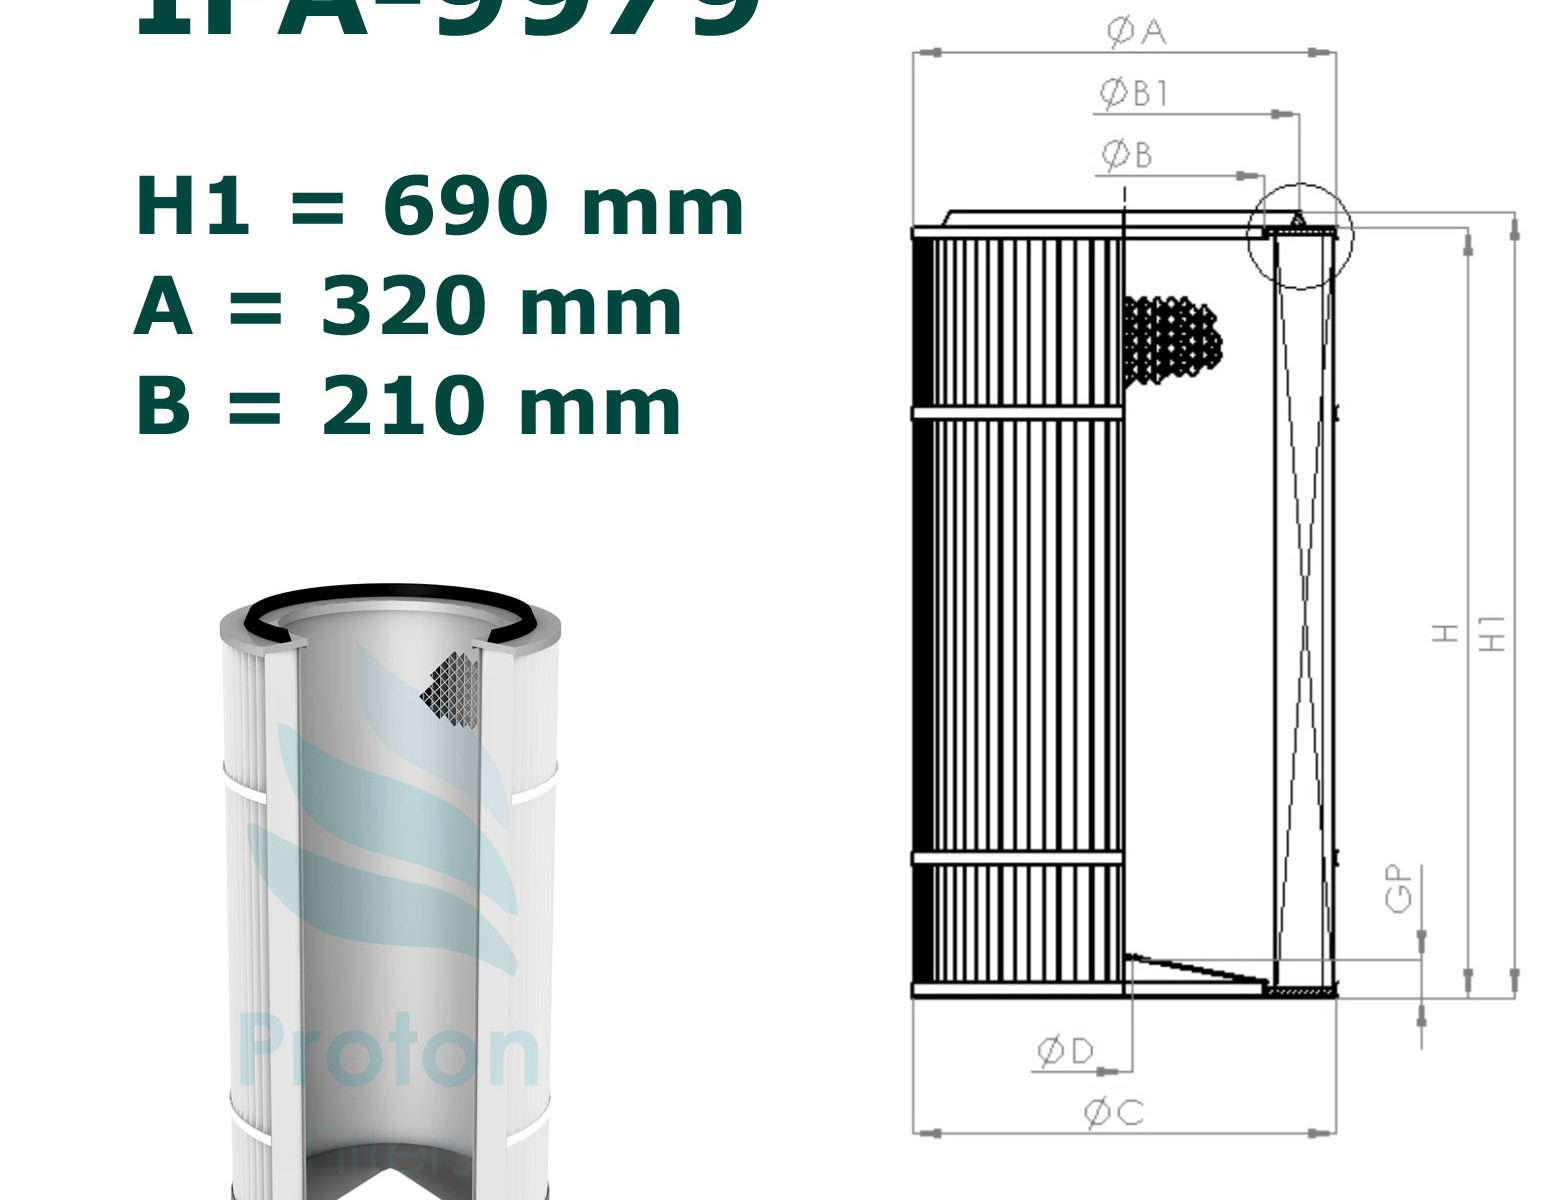 IFA-9979-1565x1200